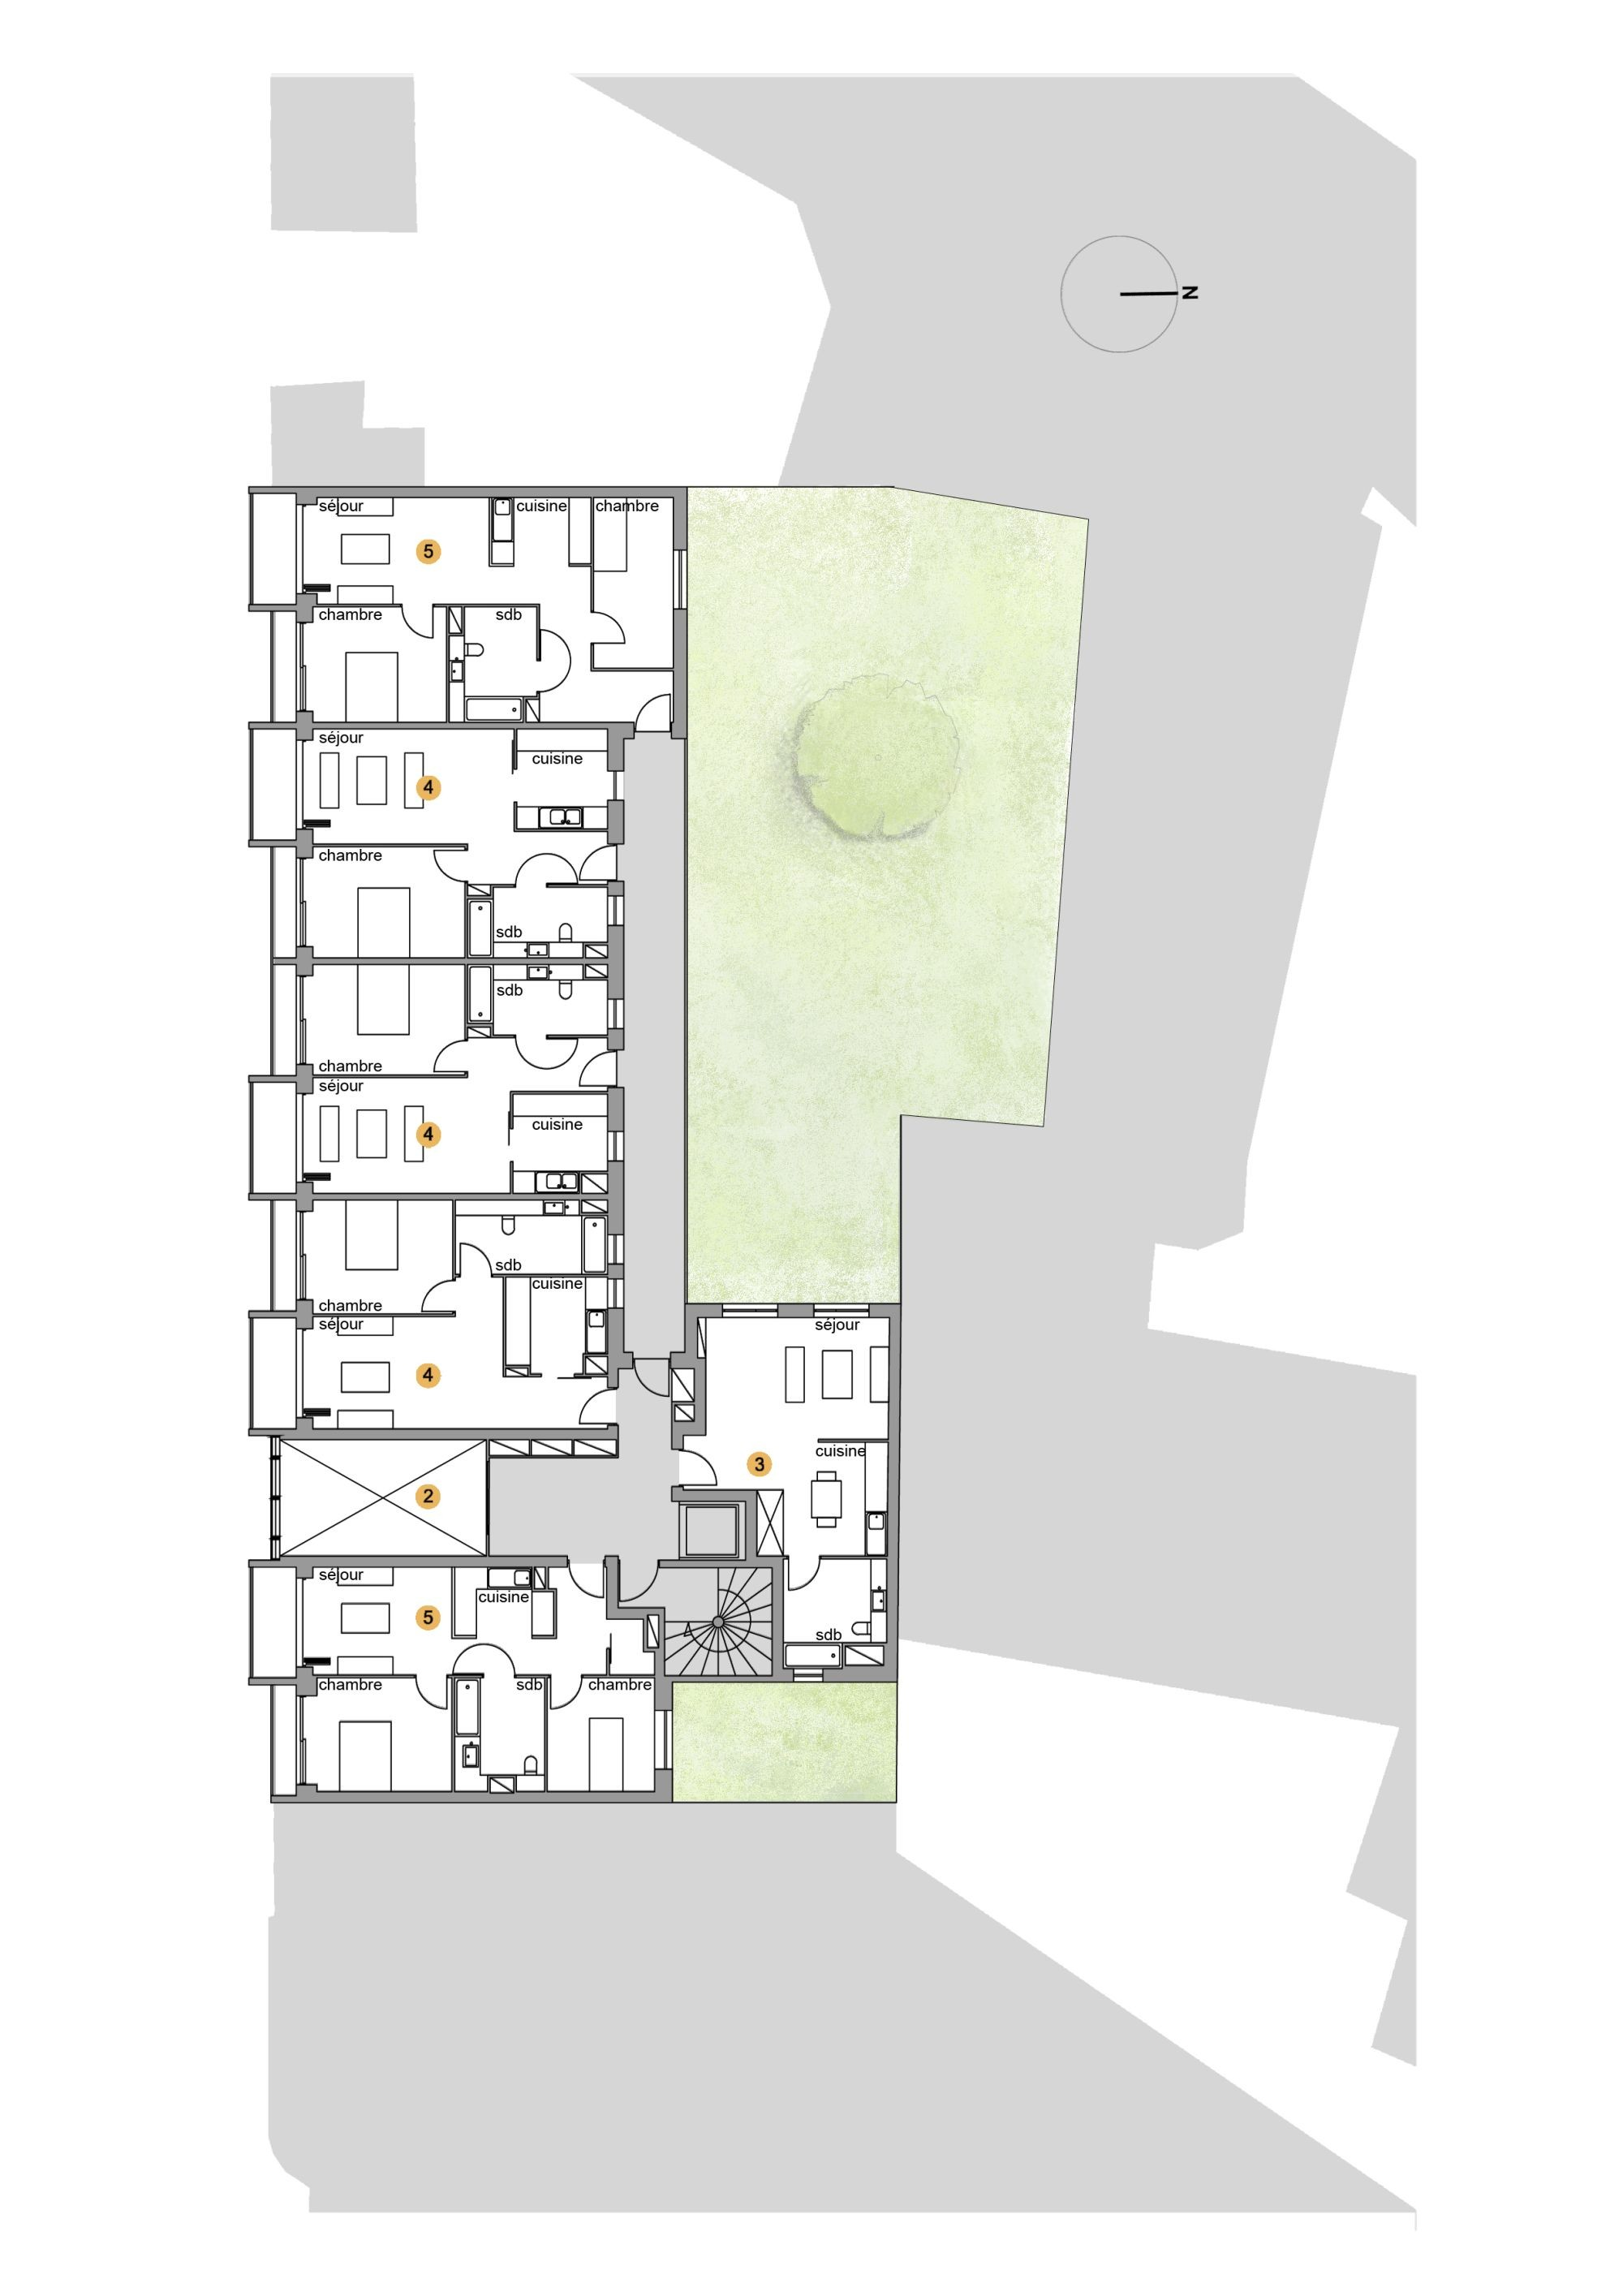 gallery of plein soleil rh architecture 29. Black Bedroom Furniture Sets. Home Design Ideas